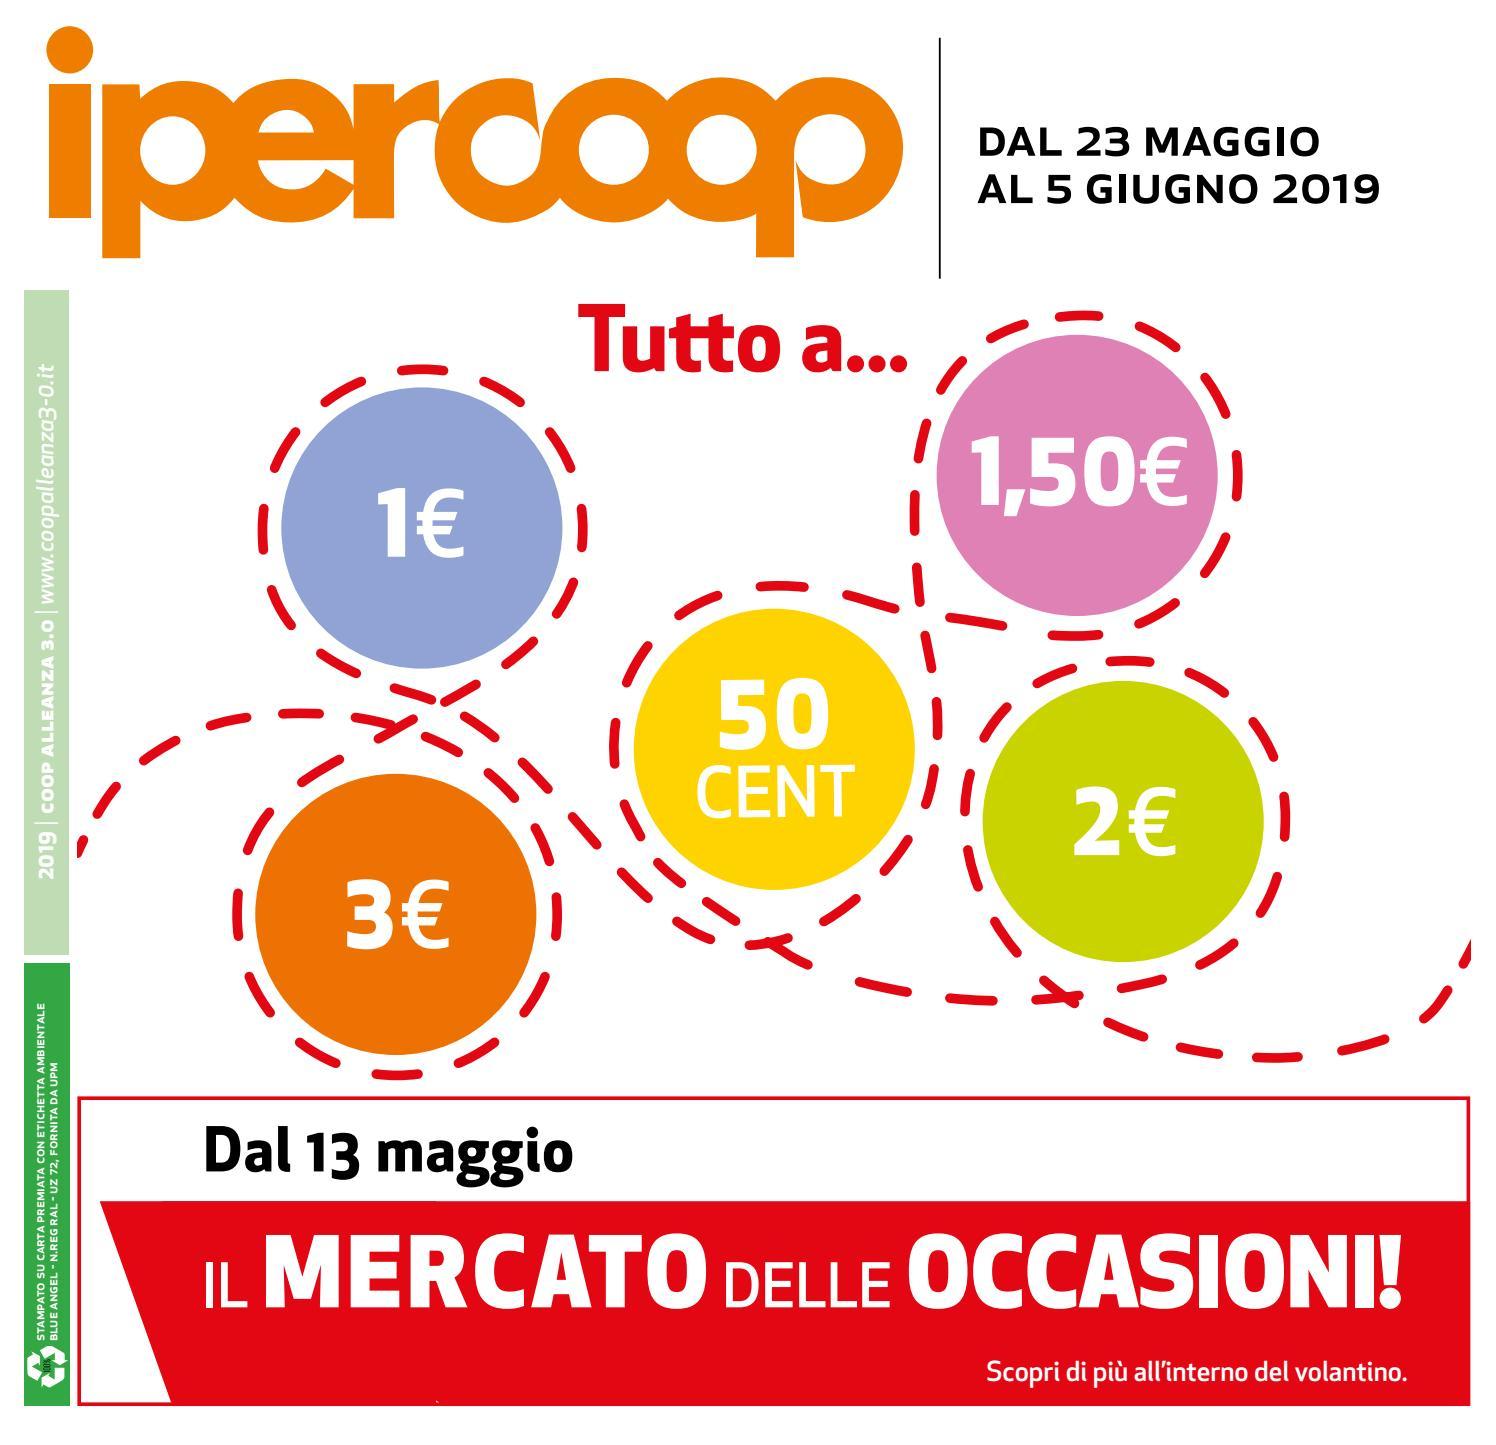 57983 Ipmk Sicilia Palermo Tutti Pdf6768222652480416970 By Coop Alleanza 3 0 Issuu